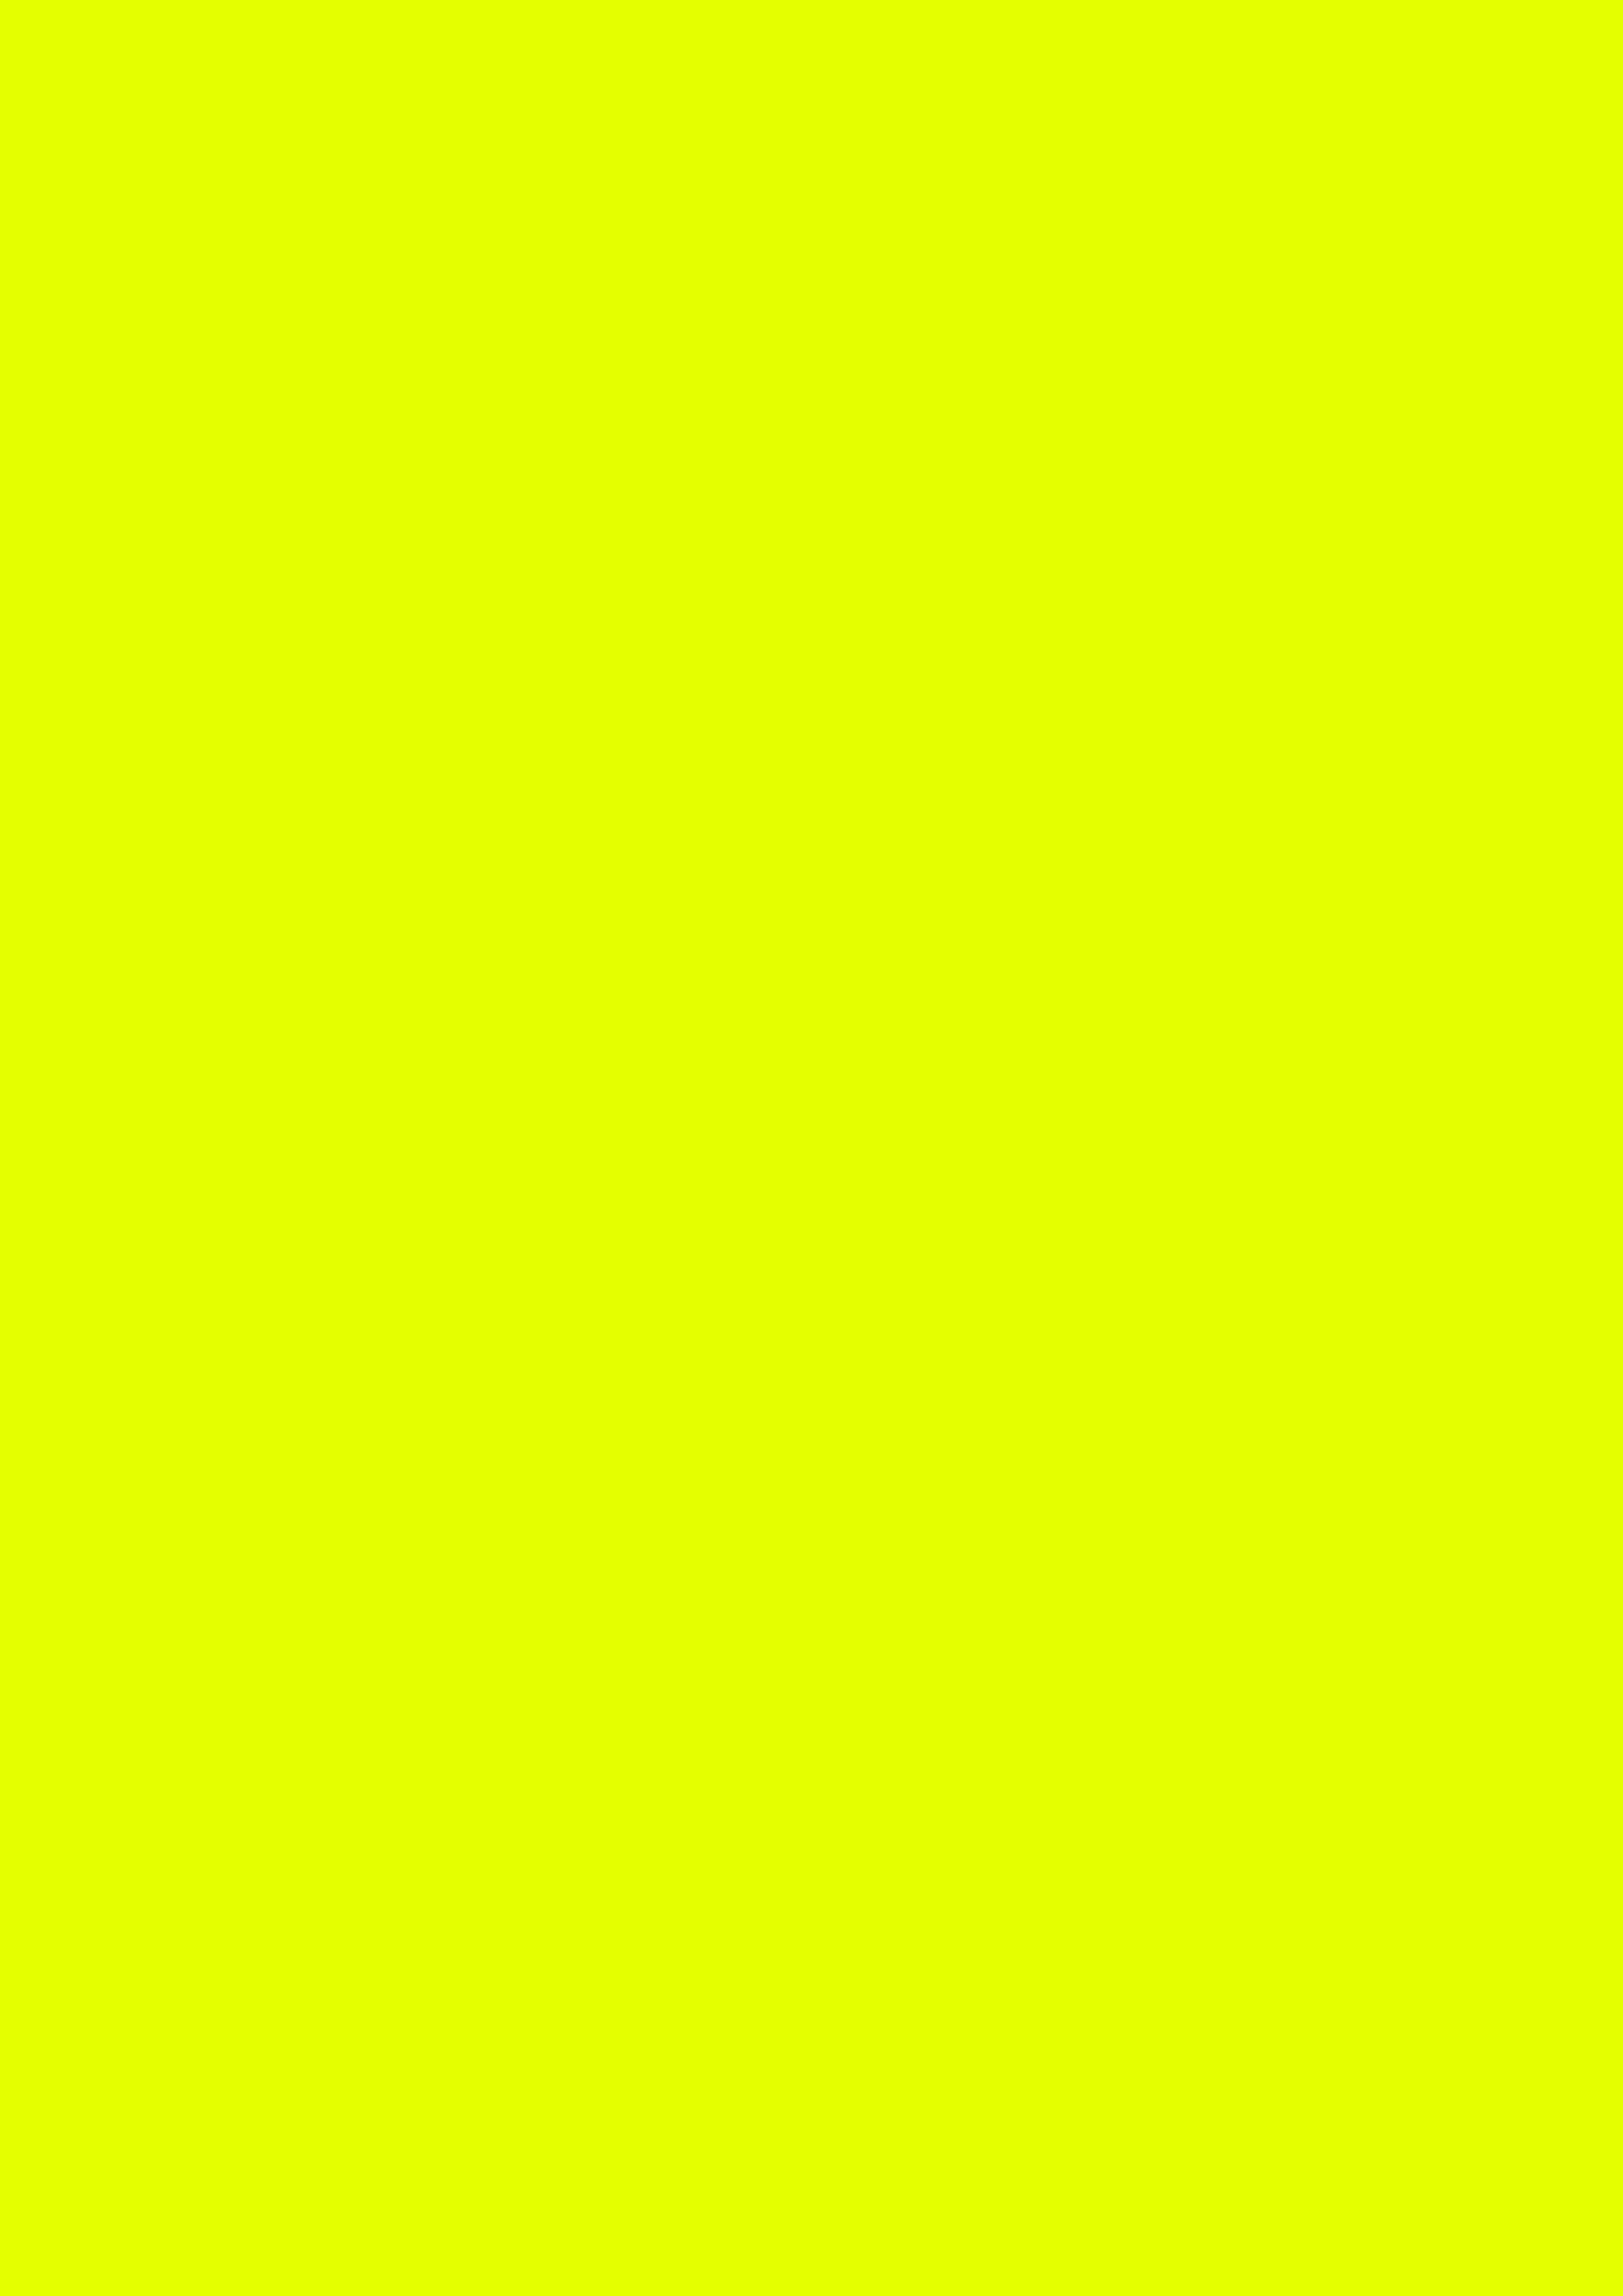 2480x3508 Lemon Lime Solid Color Background